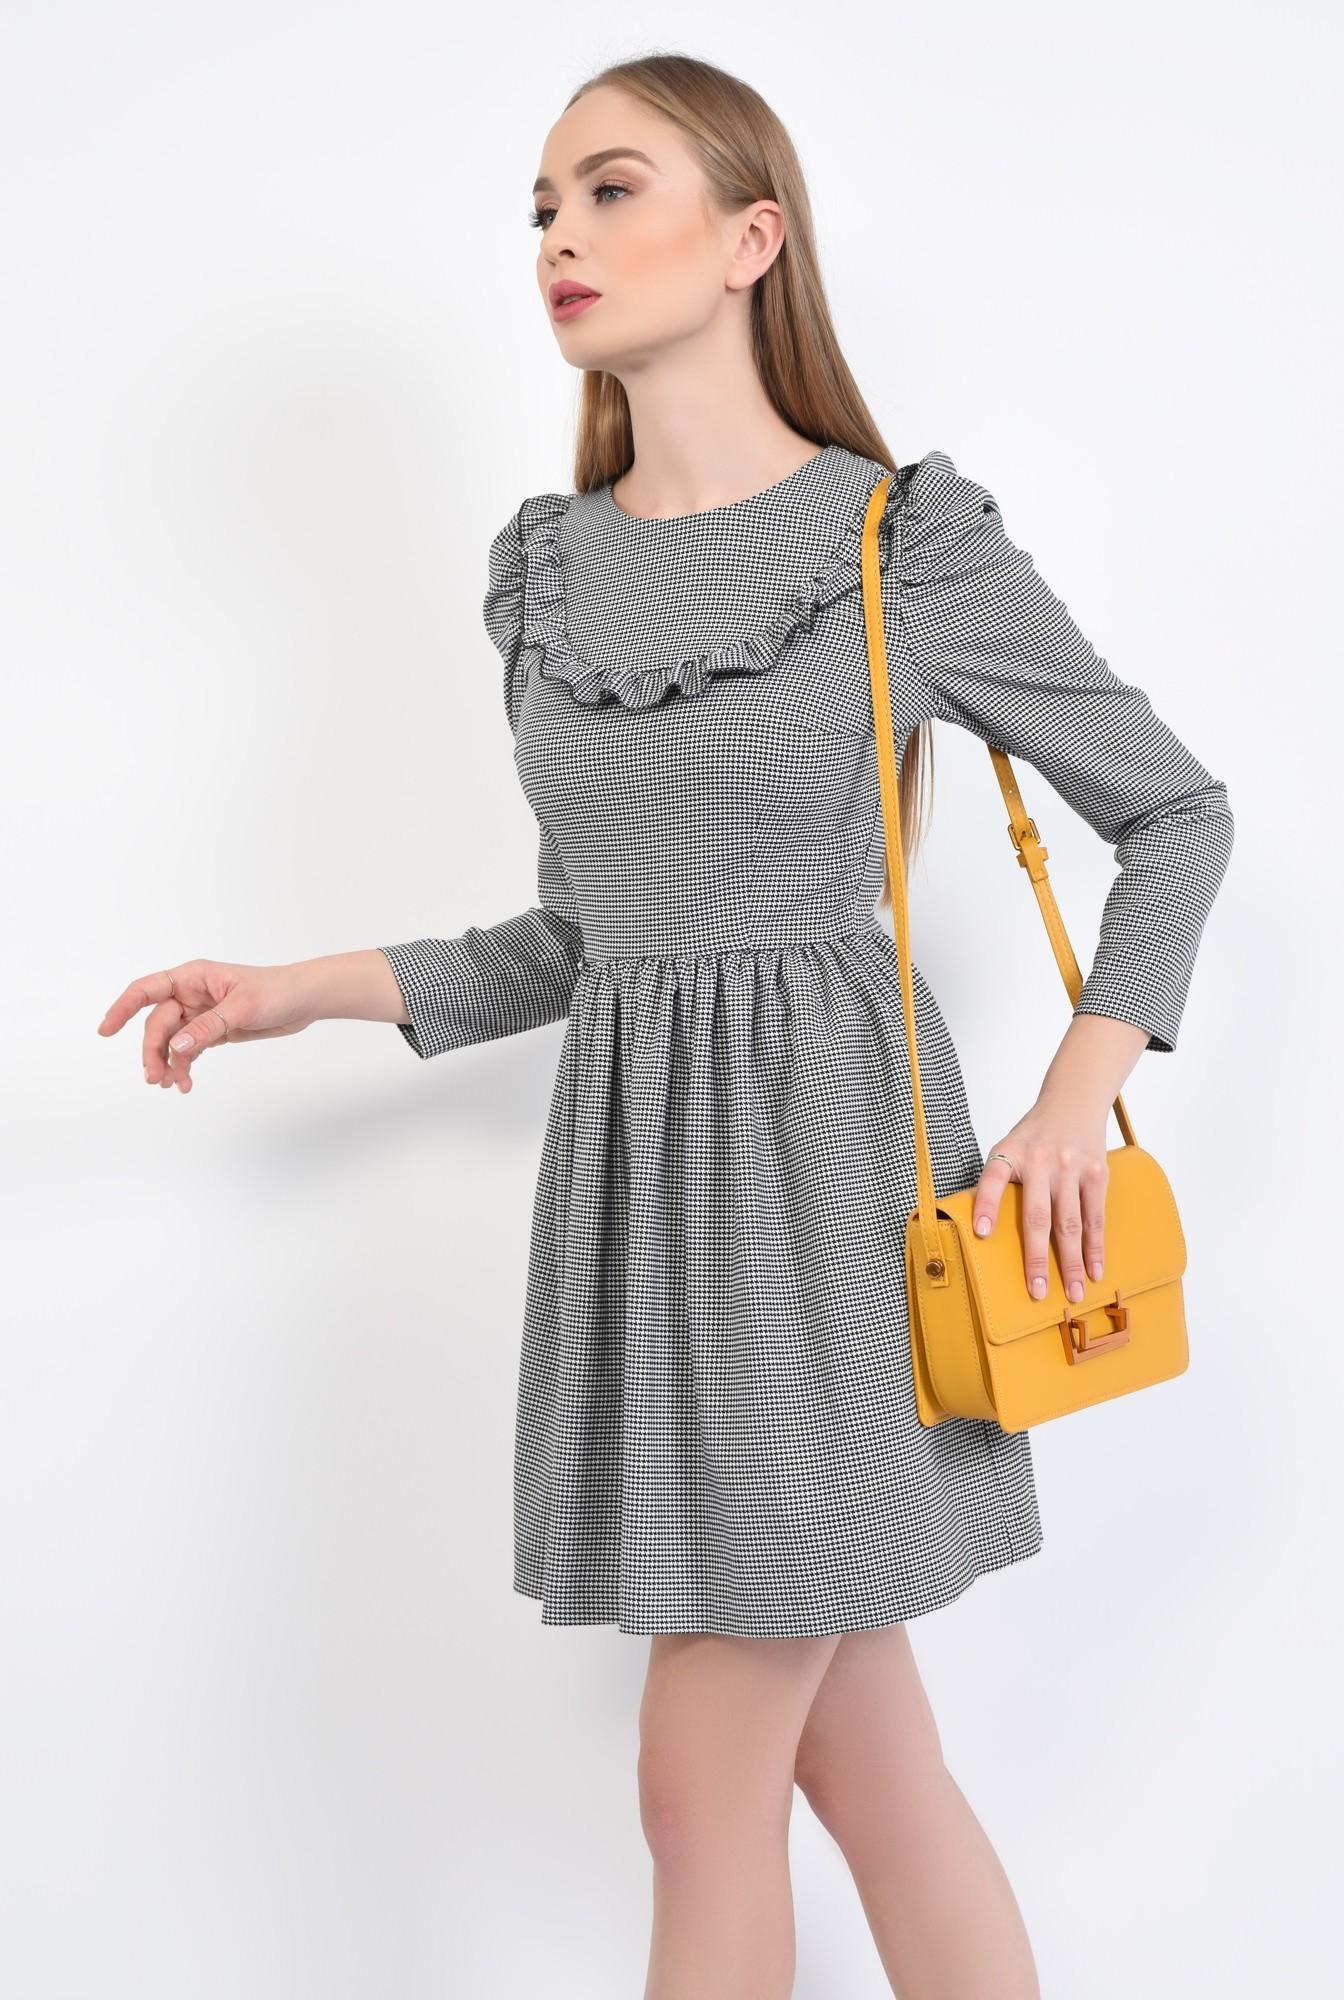 3 - geanta casual, mustar, medie, accesorii